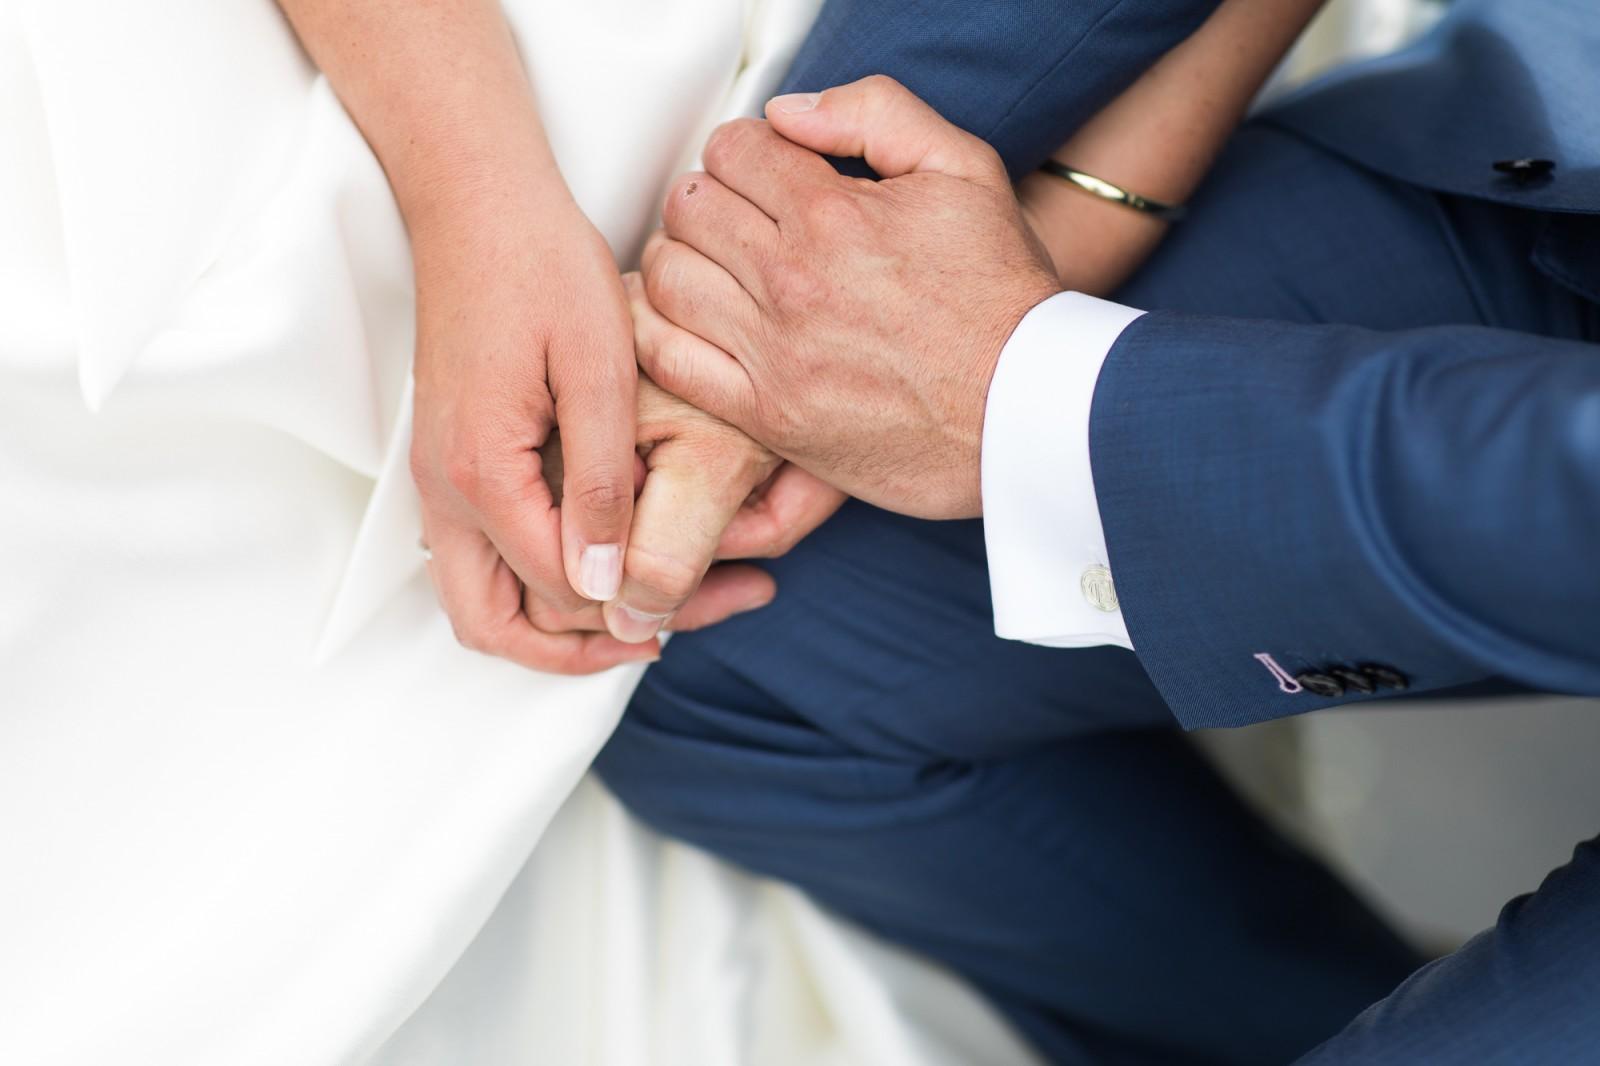 Handen bruid en bruidegom